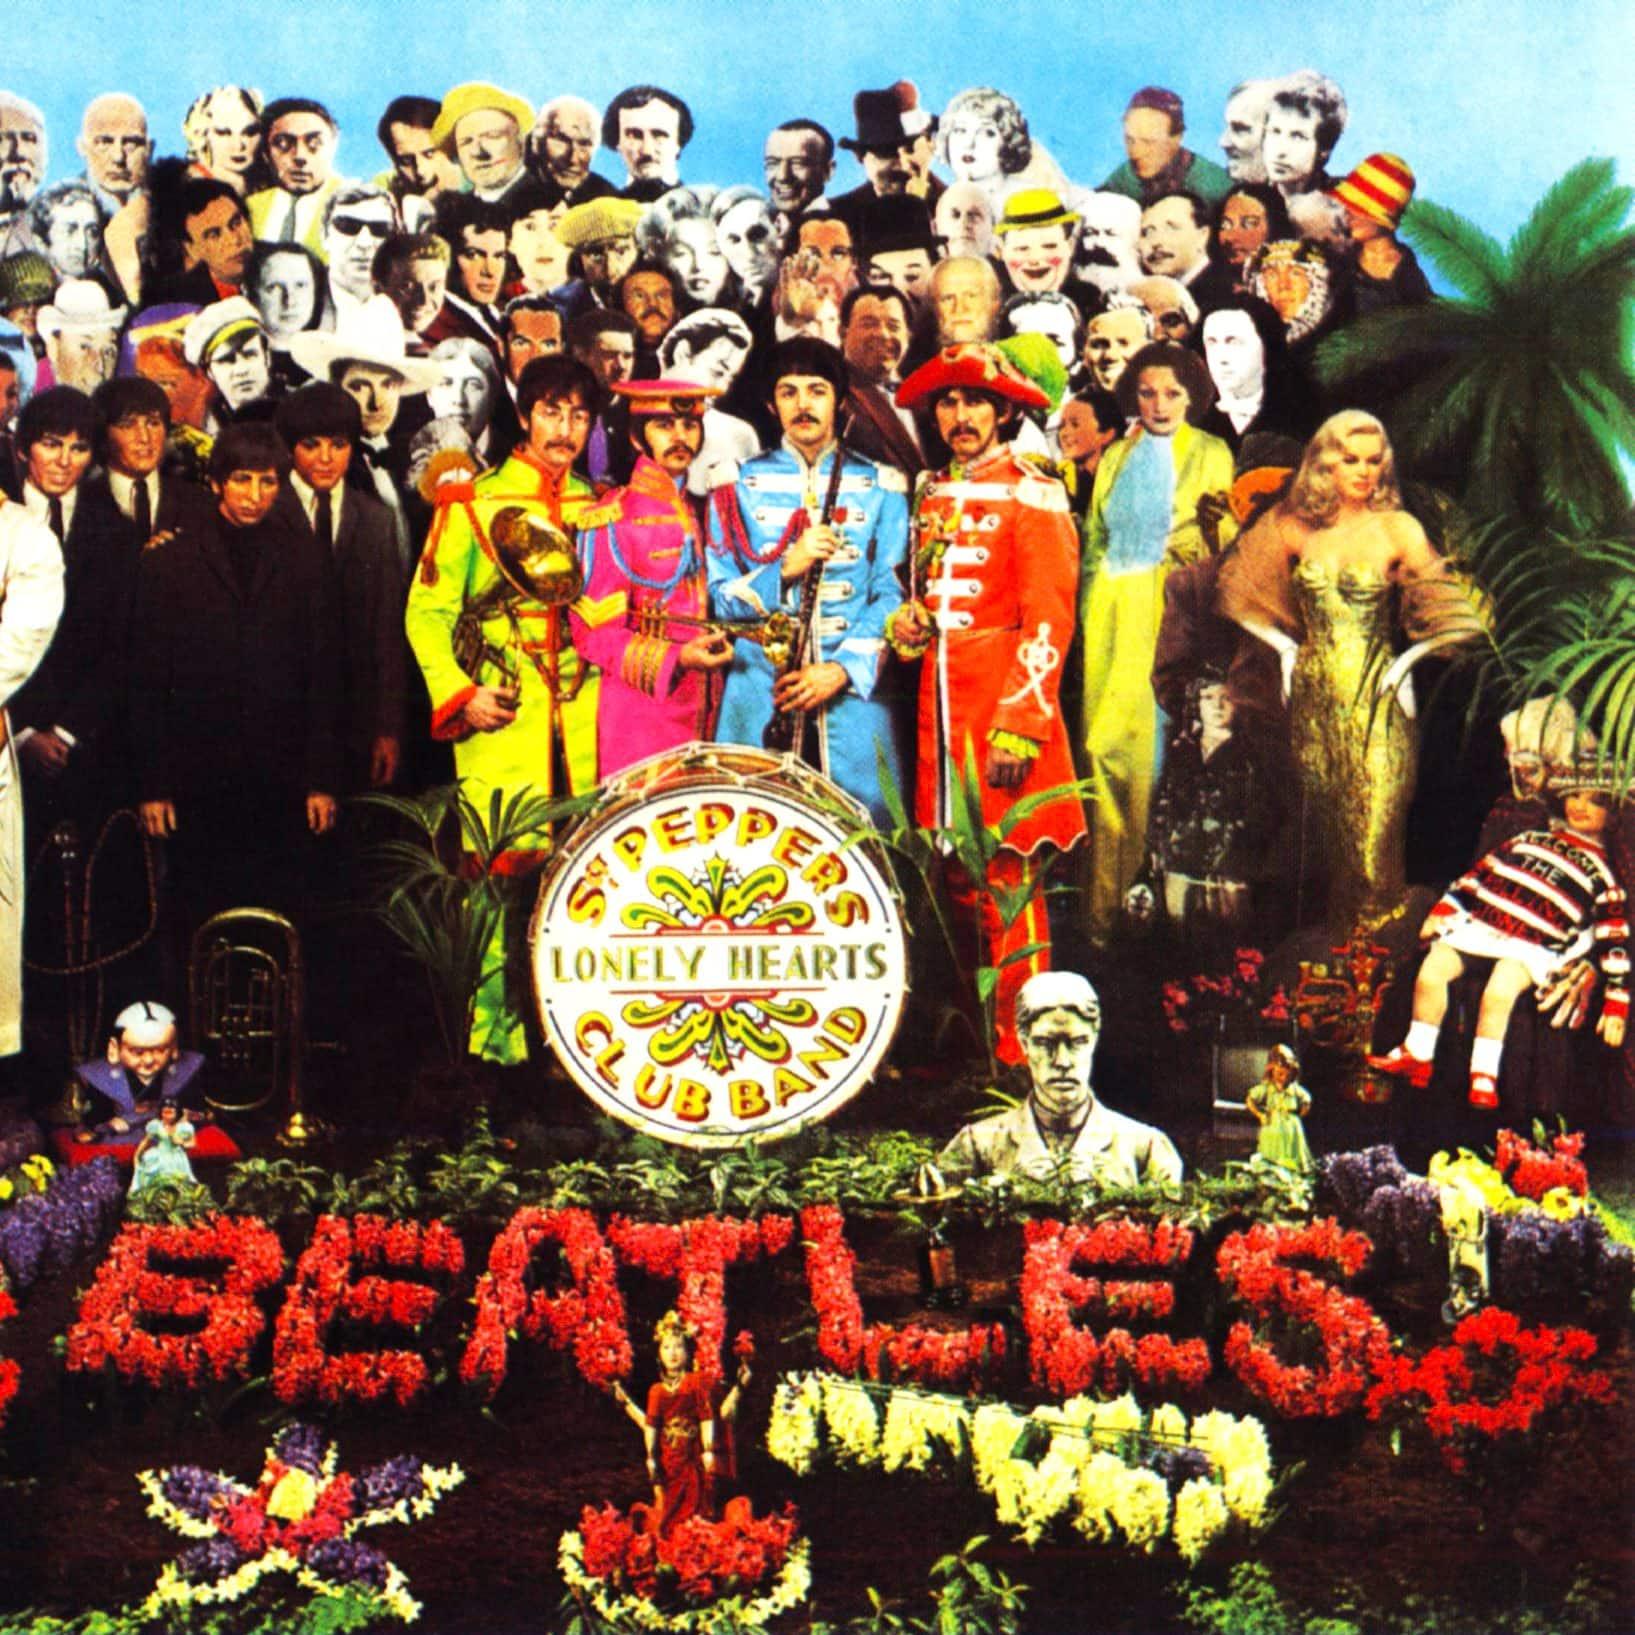 Blake's design for the Beatles' eighth album, 1967